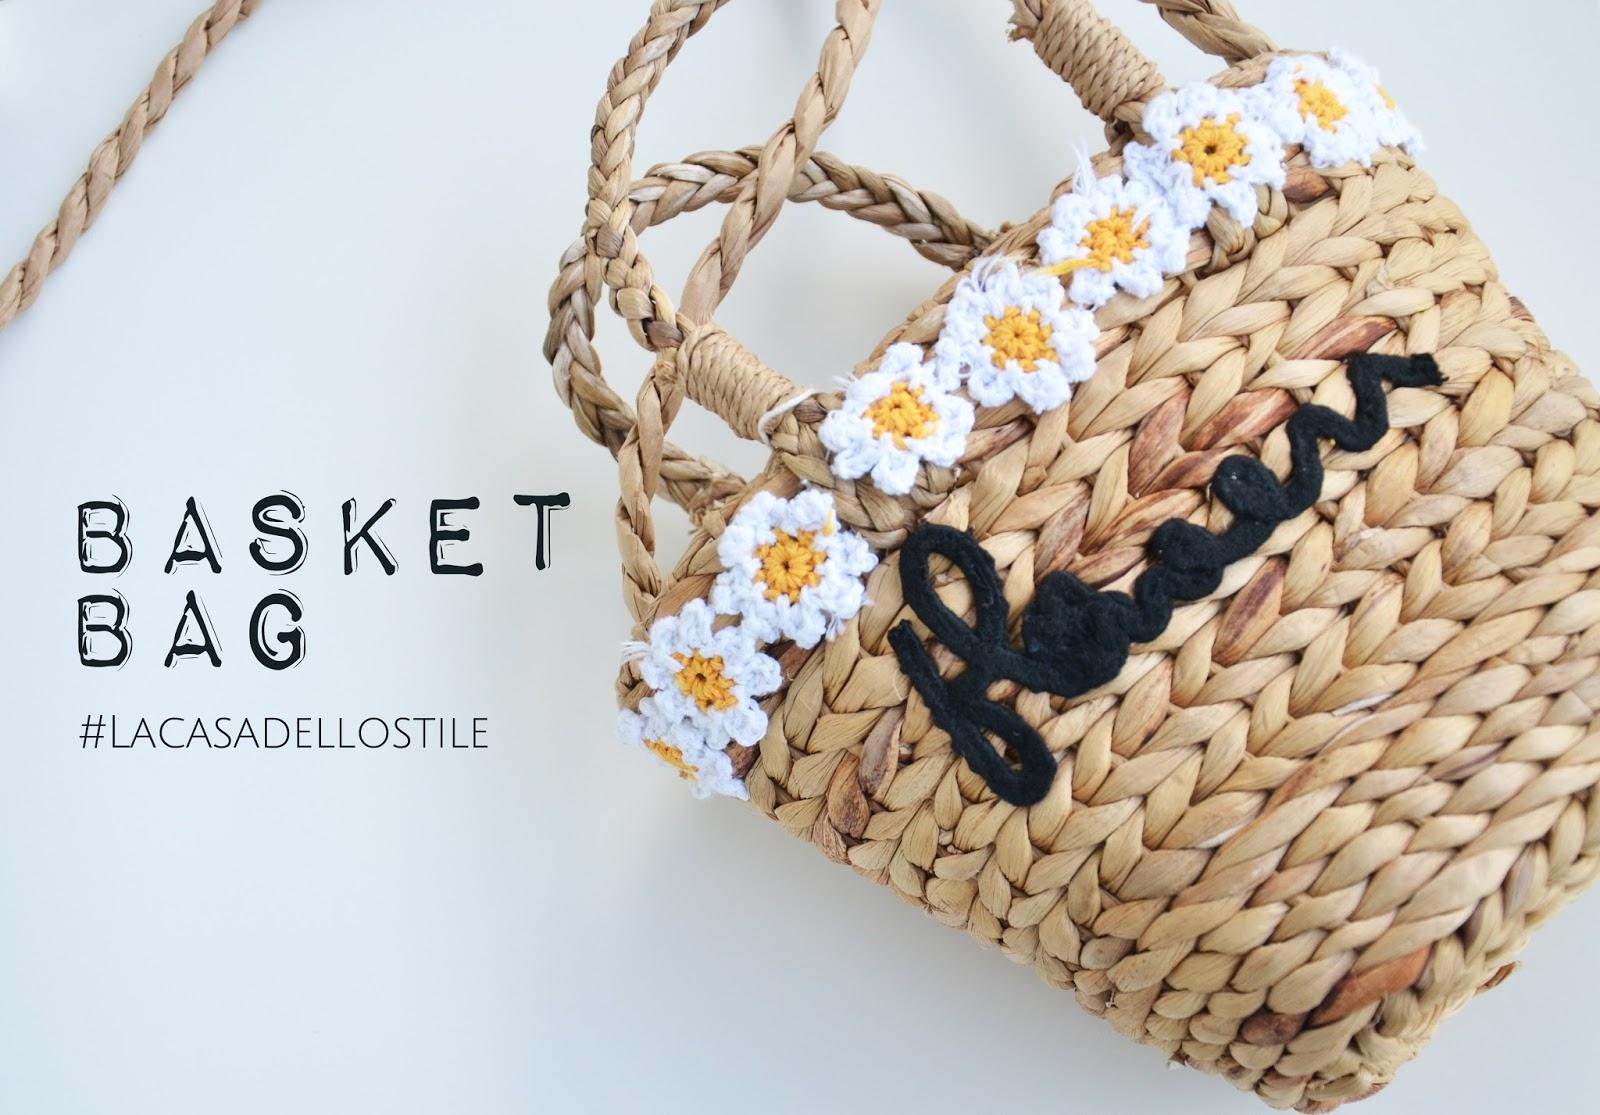 La casa dello stile: Basket bag: la borsa della primavera